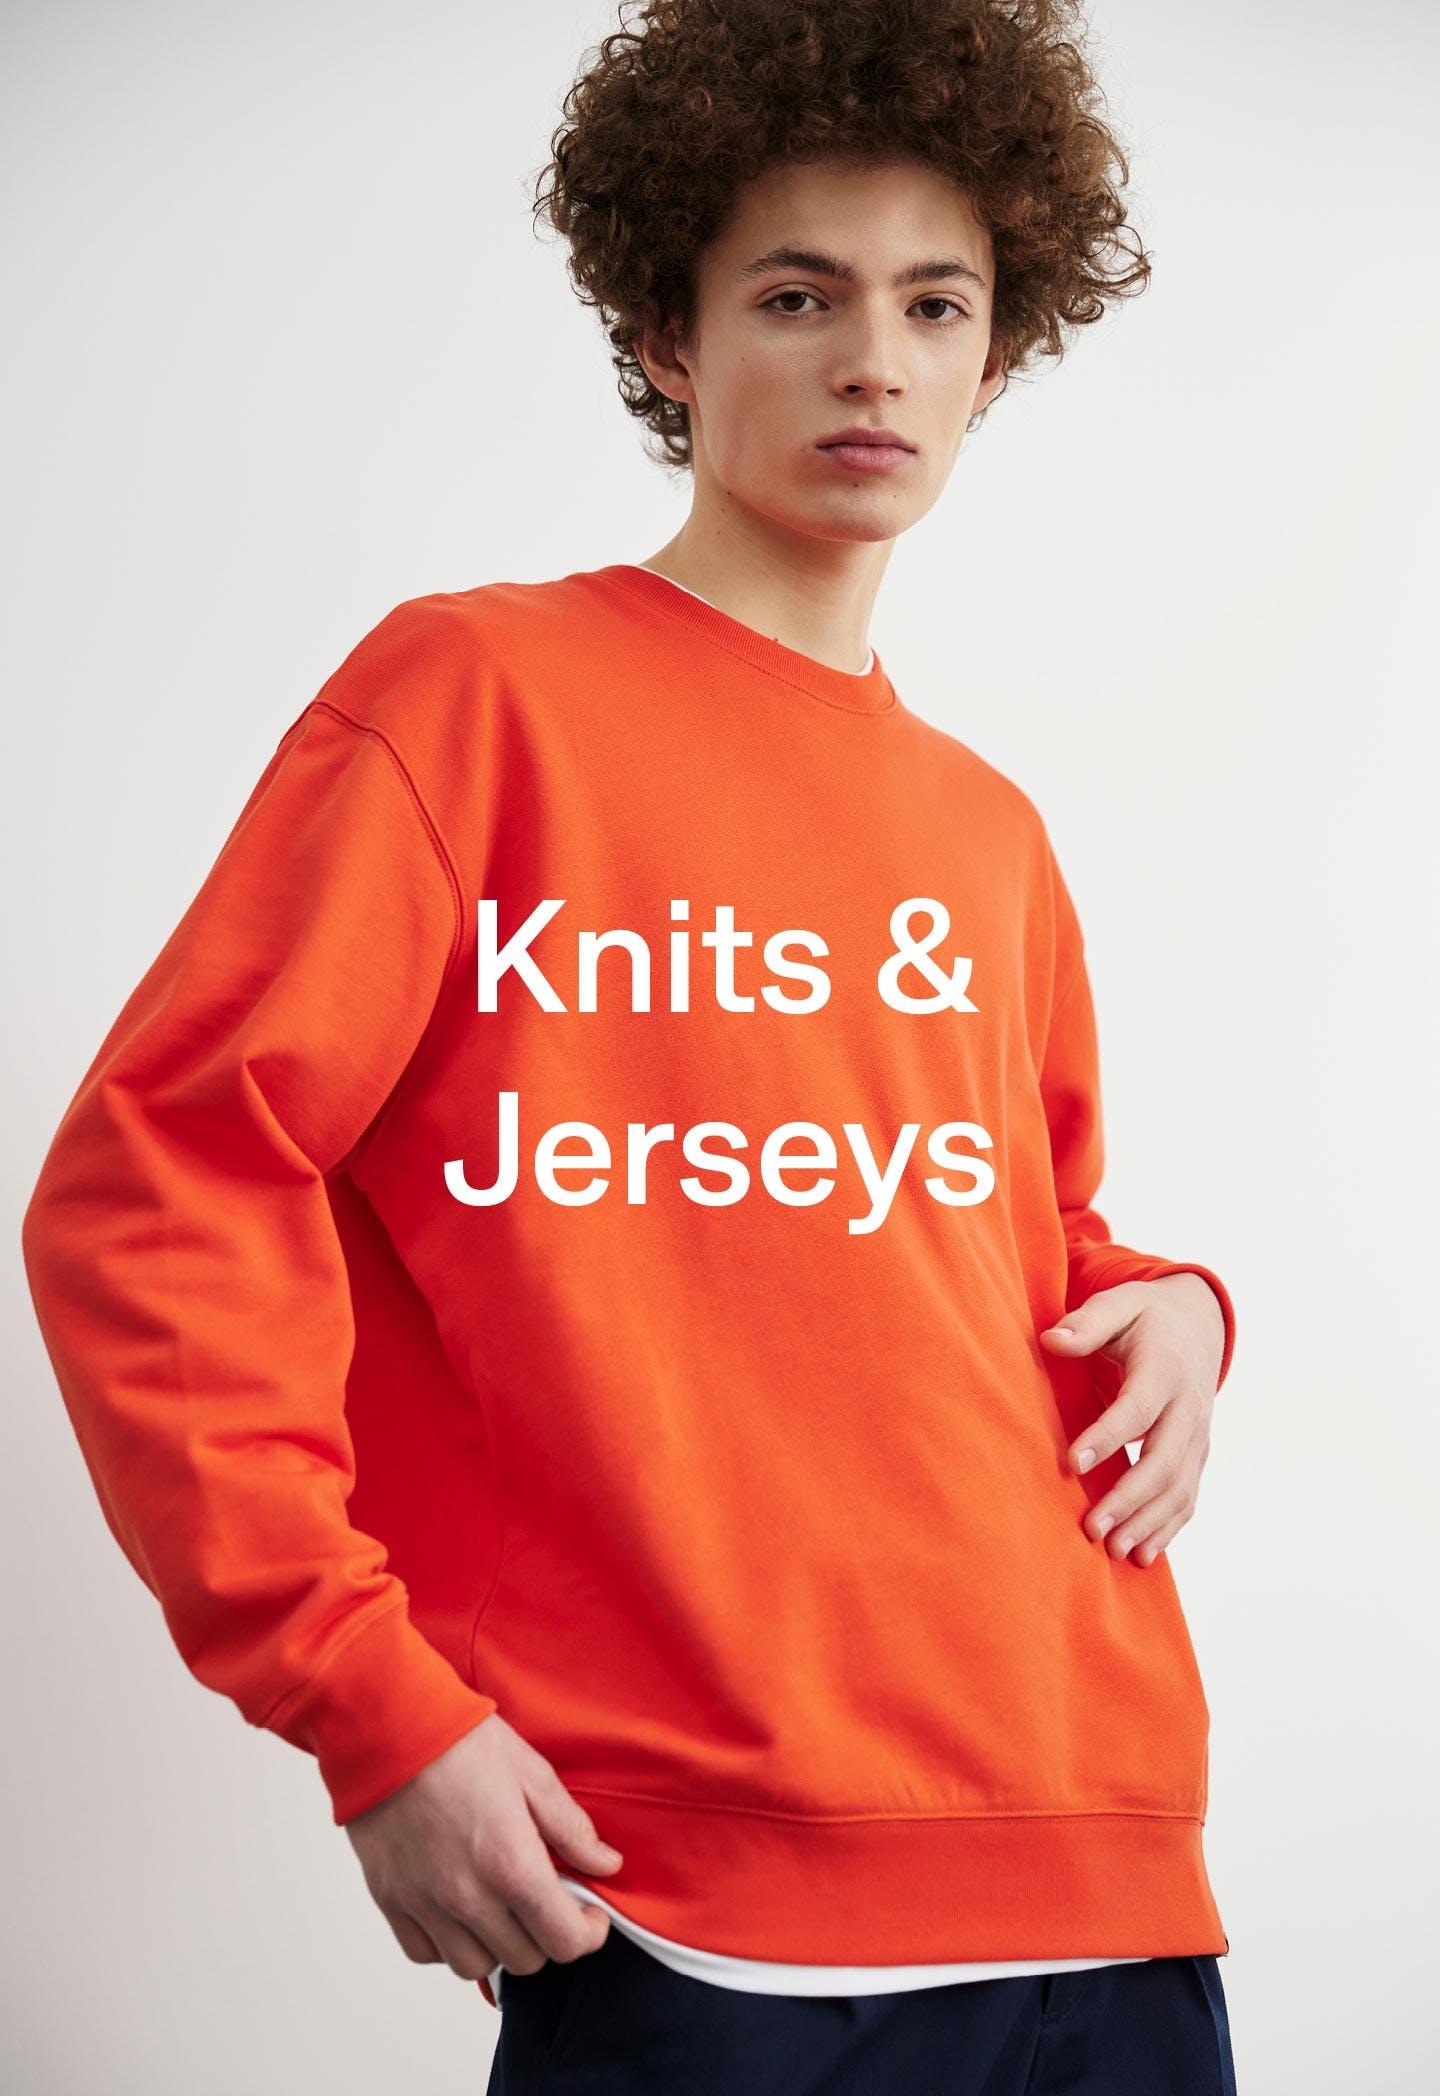 Knits & Jerseys | Studio Seidensticker